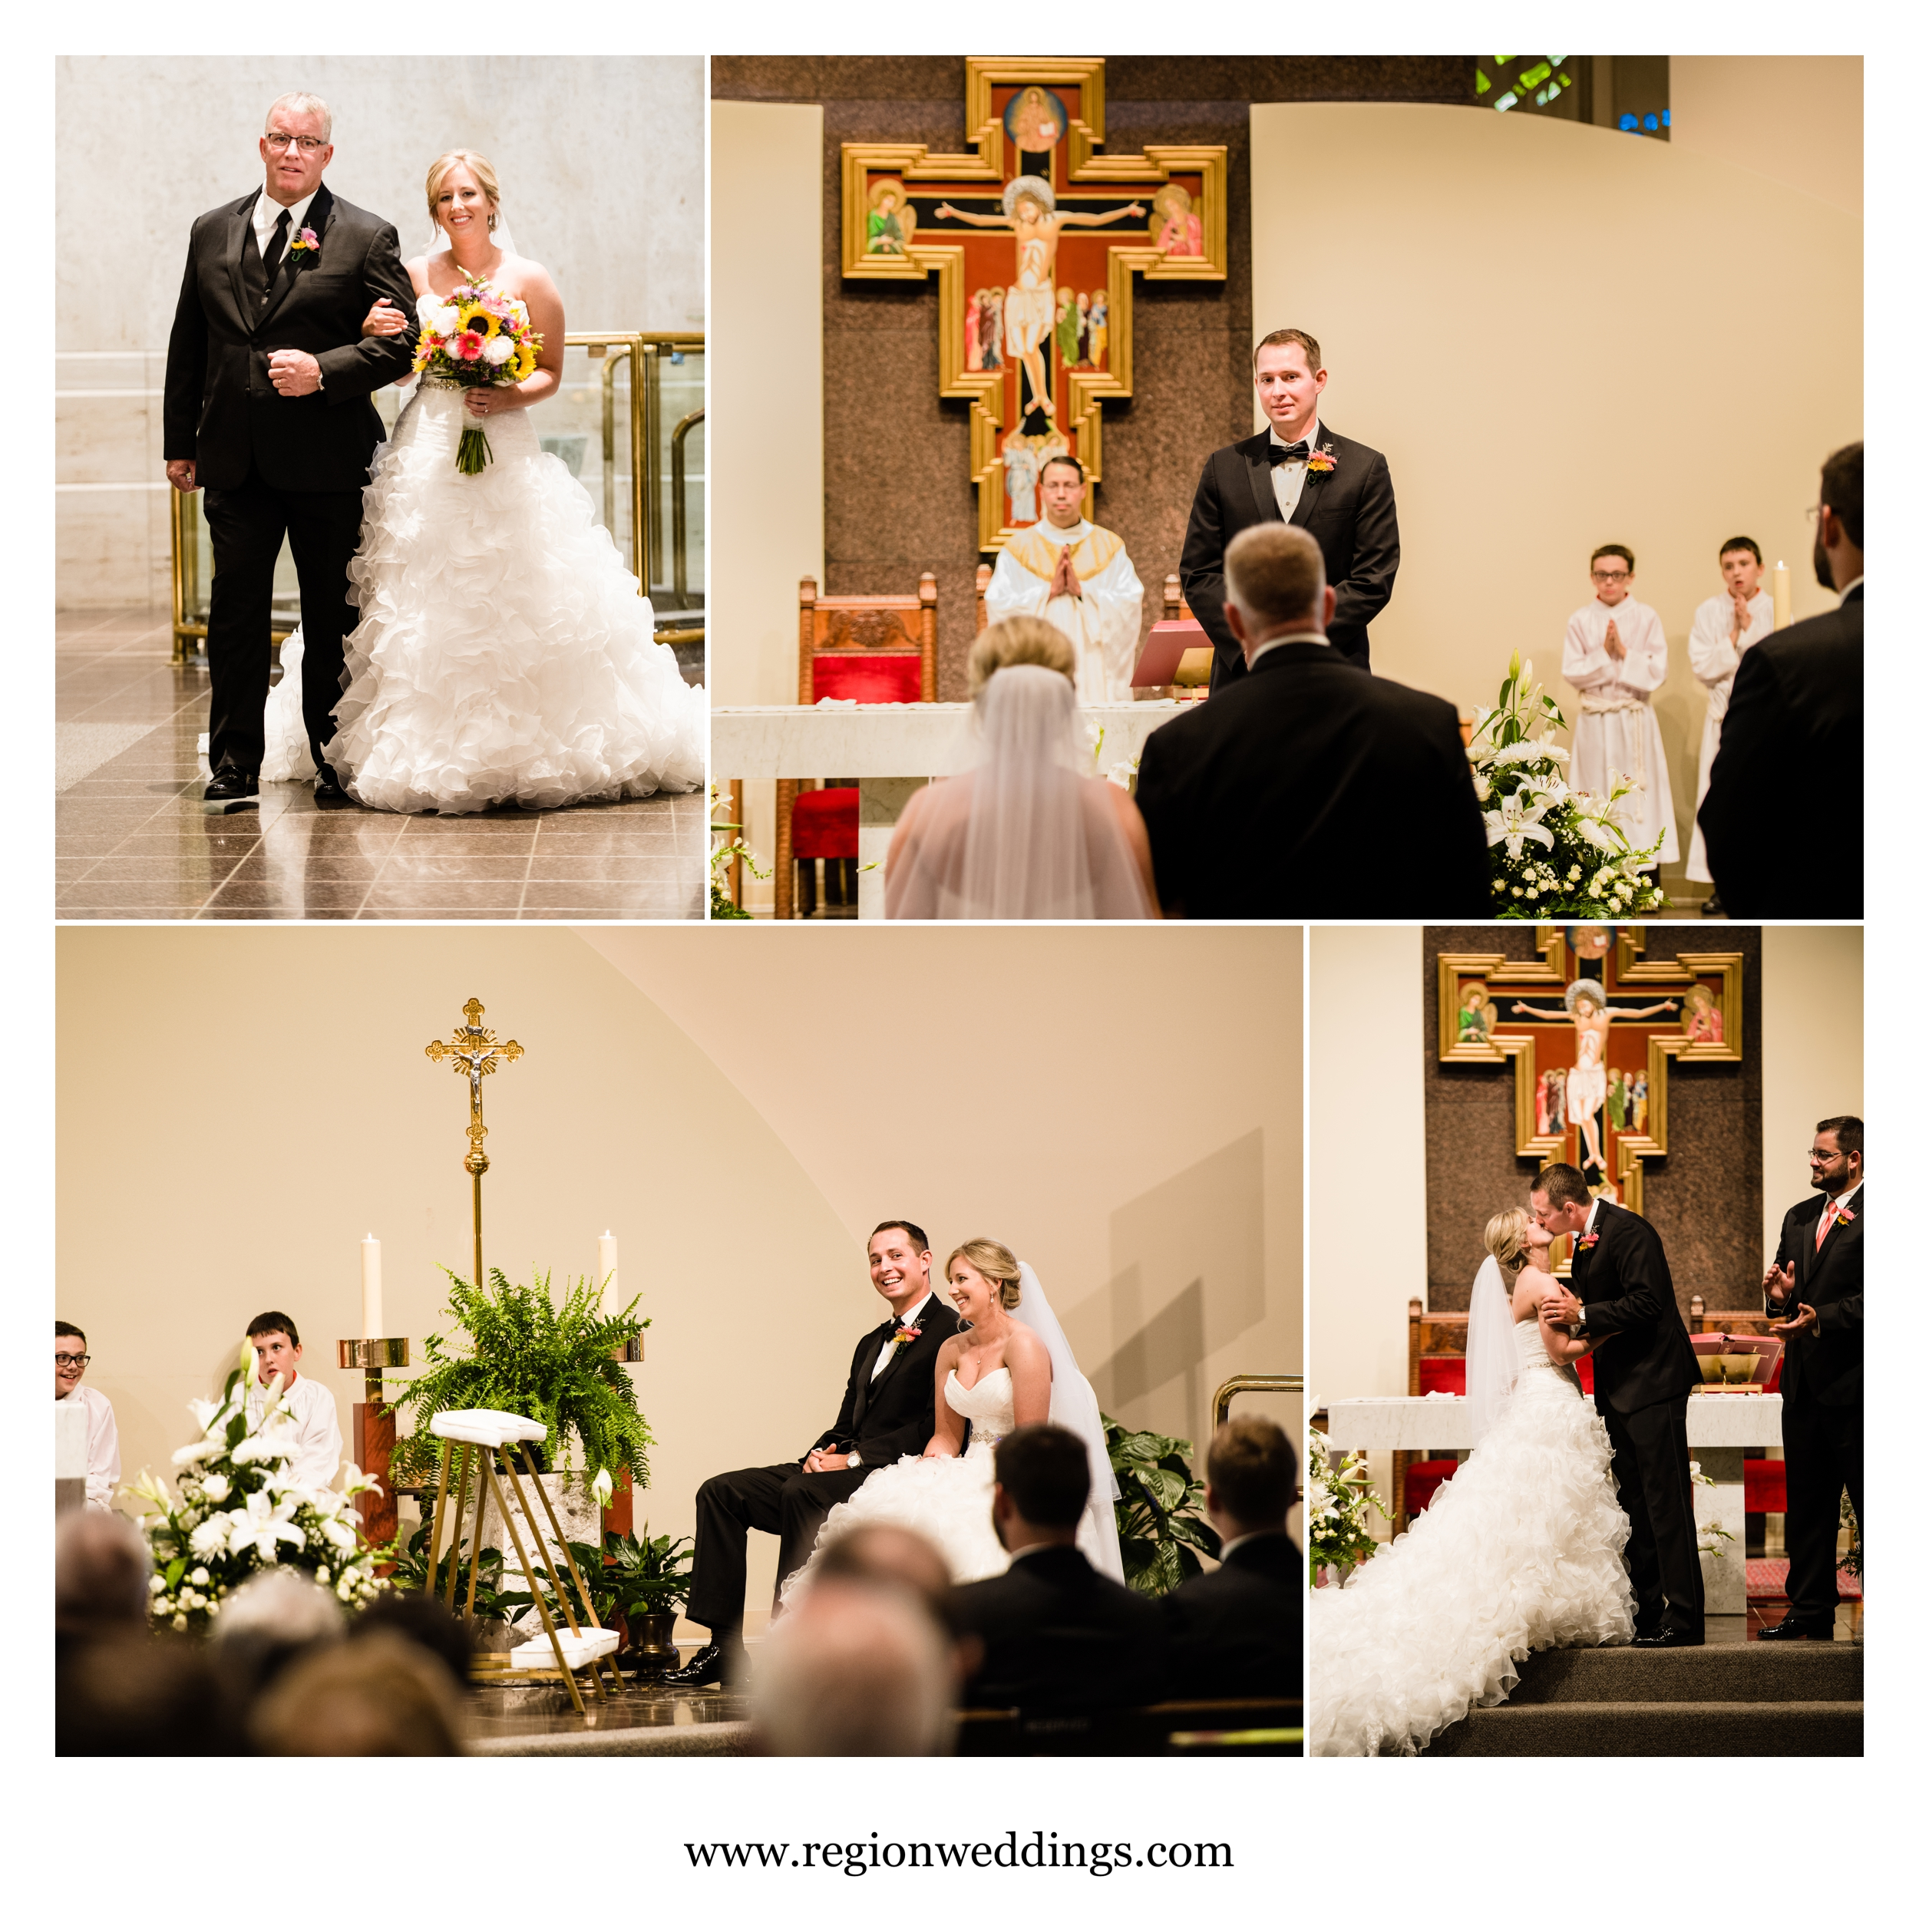 Wedding ceremony at Saint Paul Catholic Church in Valparaiso, Indiana.